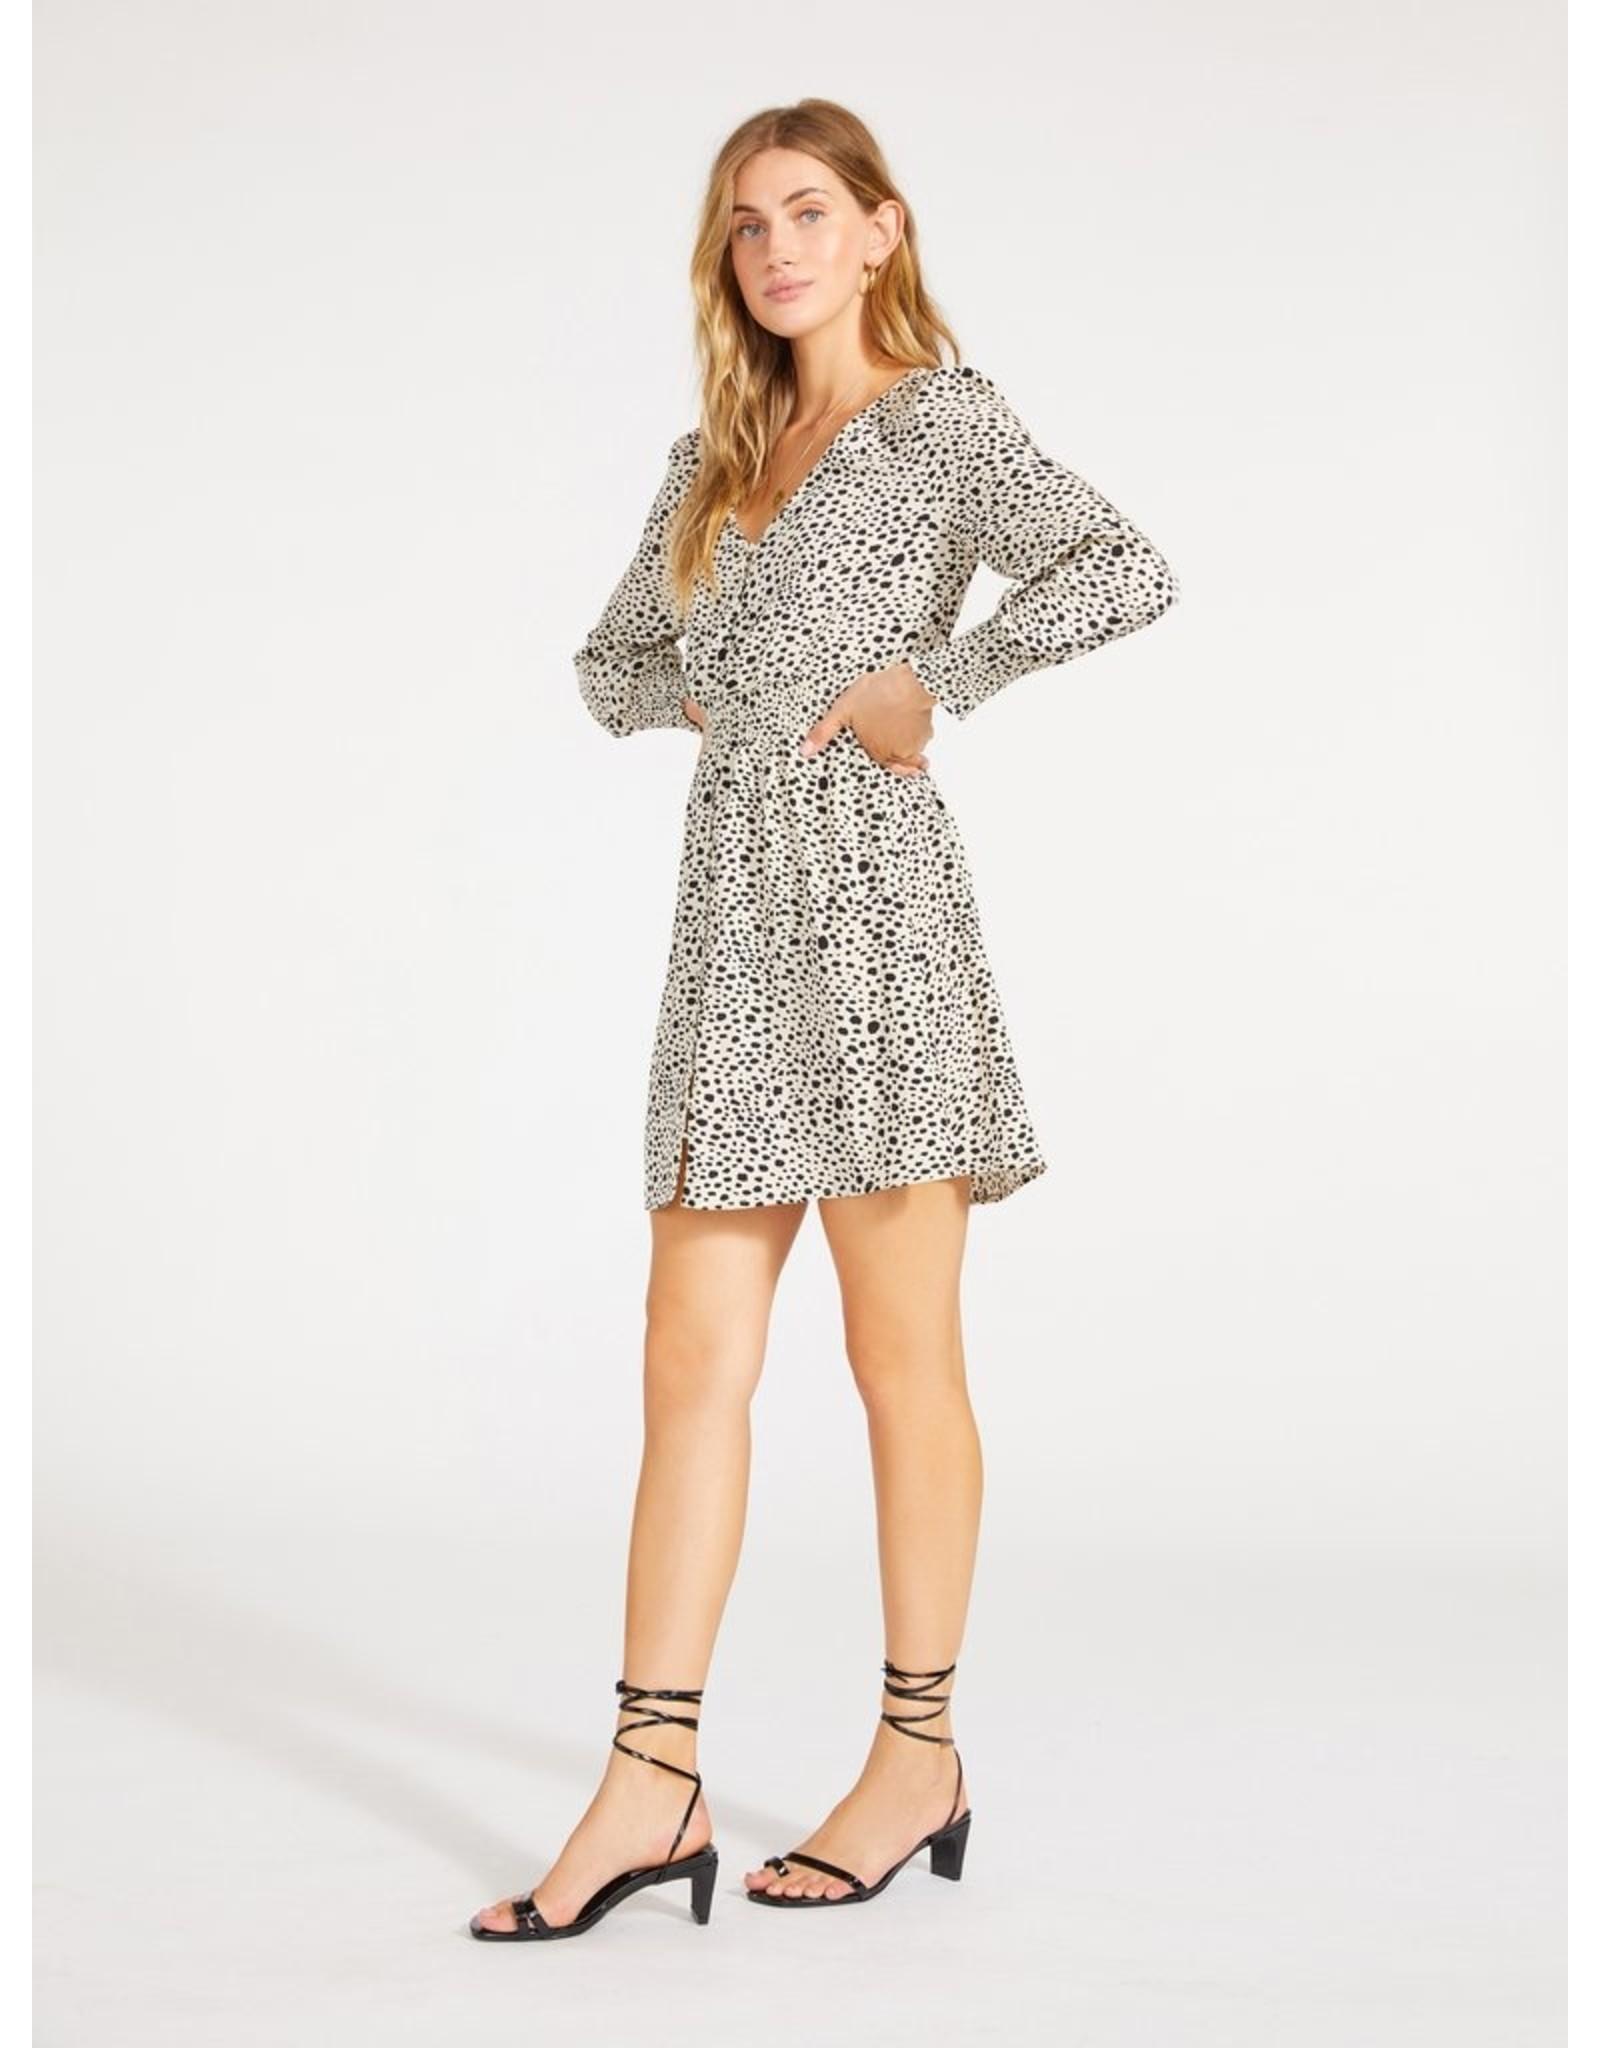 BB Dakota - Spot A Cutie Dress